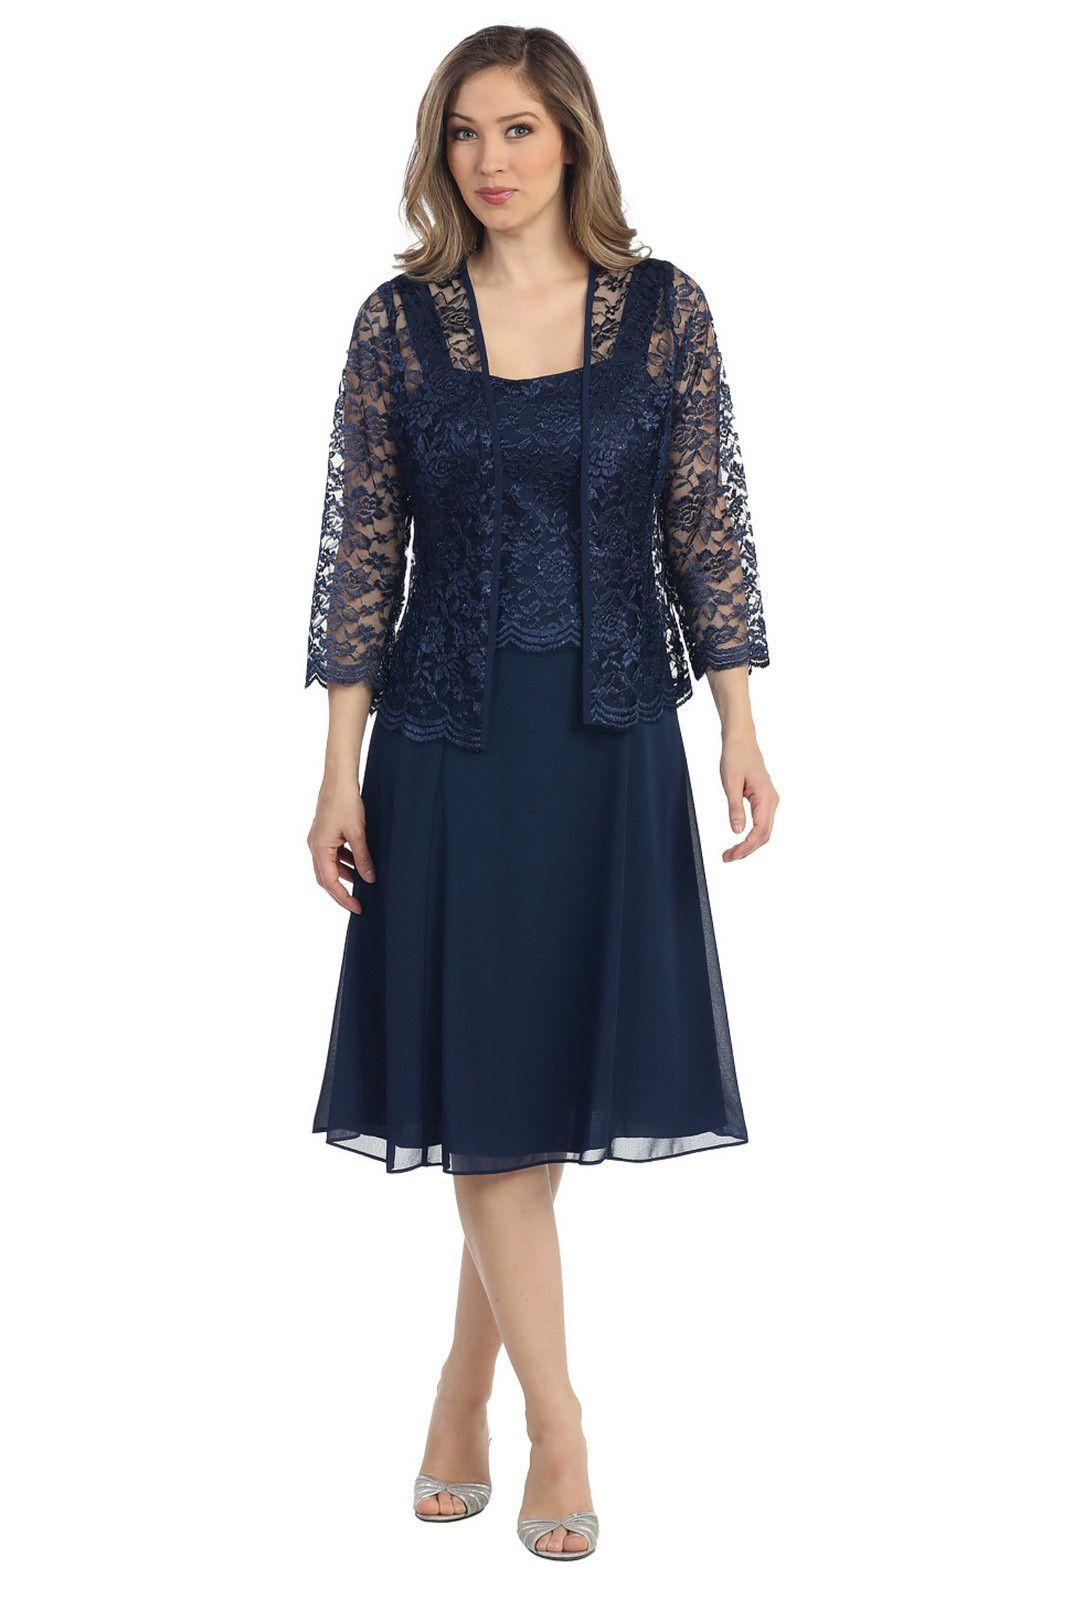 Ronald joyce lace wedding dress september 2018 Patricia Mejia pestradamejia on Pinterest